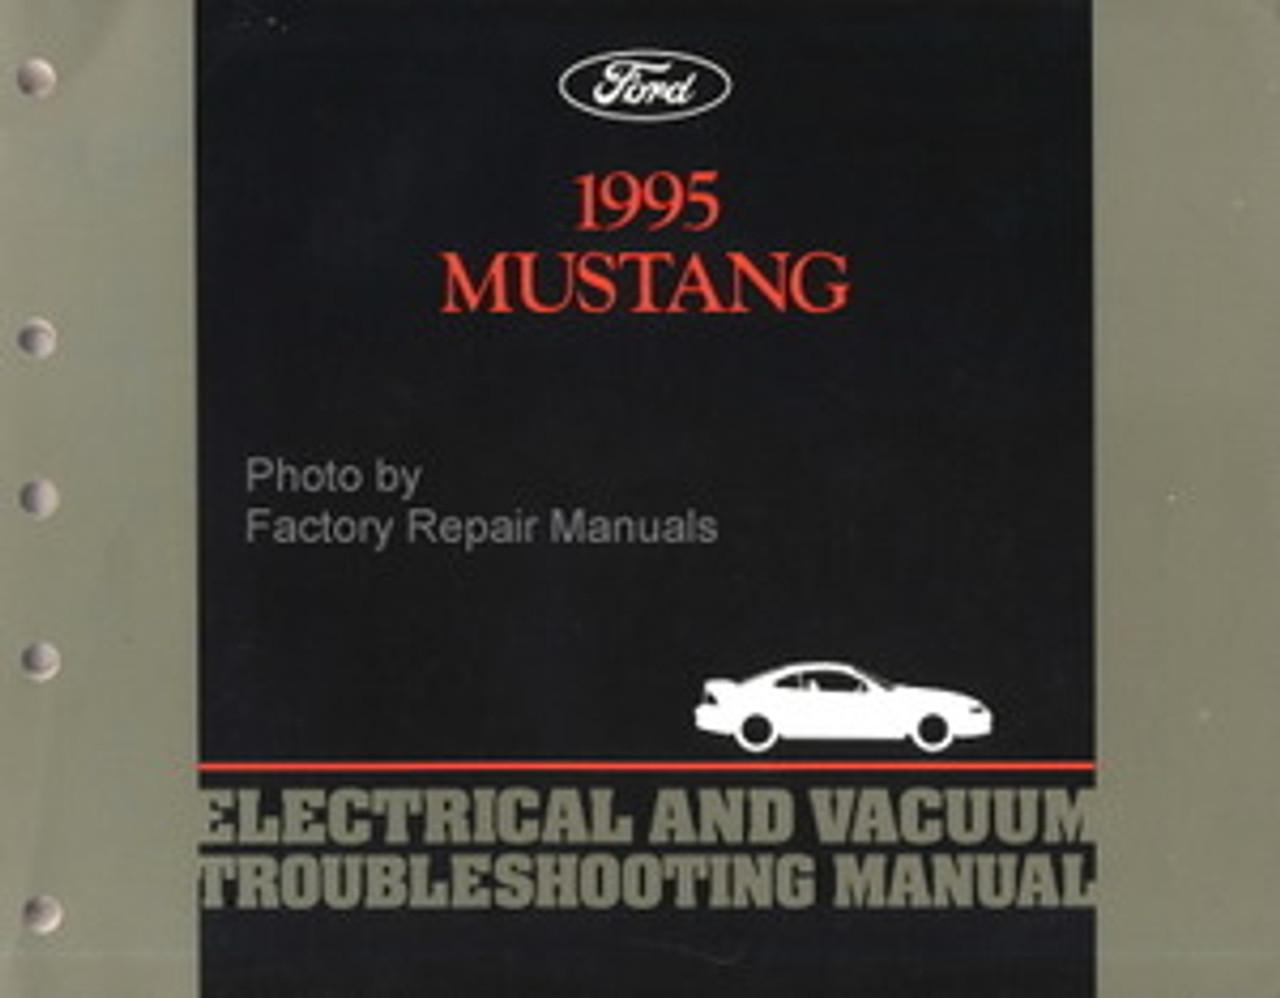 1995 mustang wiring diagram 1995 ford mustang electrical   vacuum troubleshooting manual  1995 ford mustang electrical   vacuum